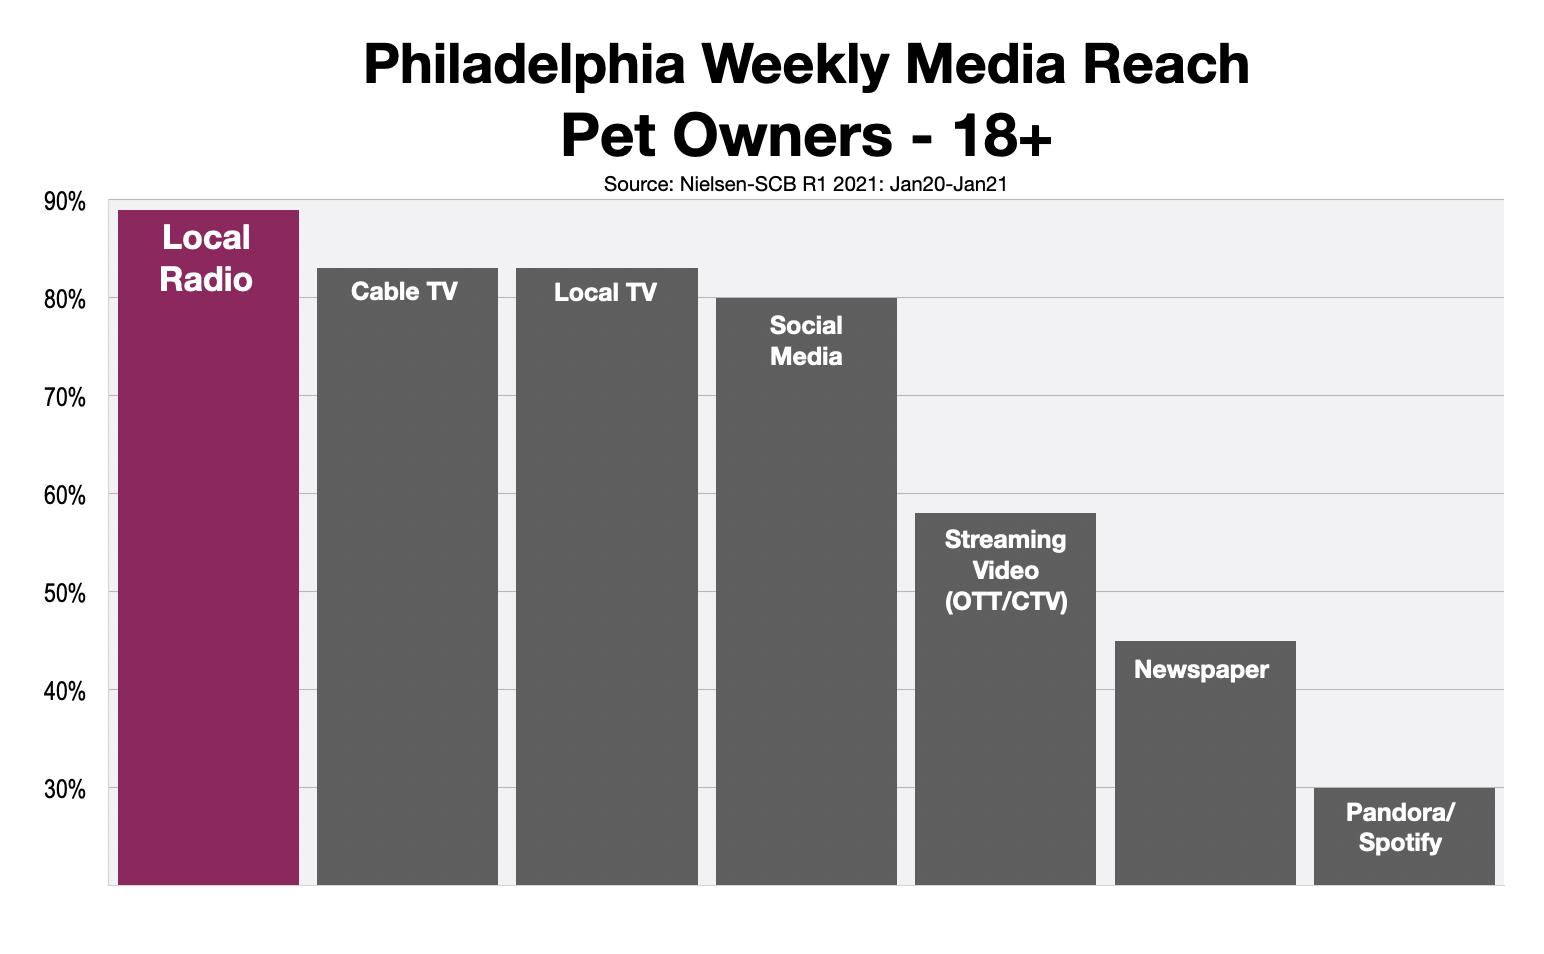 Advertising To Pet Owners In Philadelphia 2021